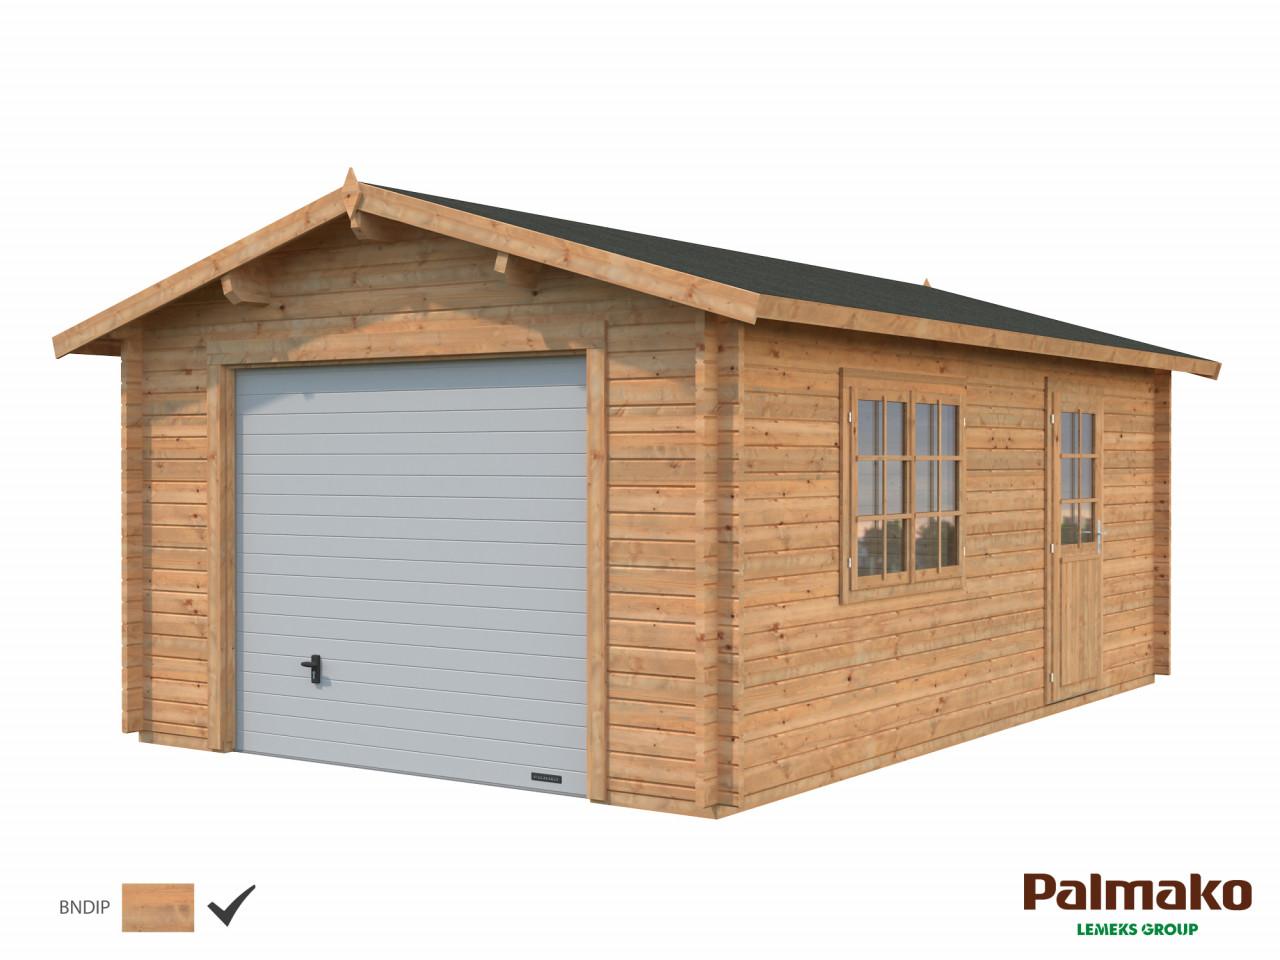 Palmako Holzgarage Roger 19,0 m² mit Sektionaltor